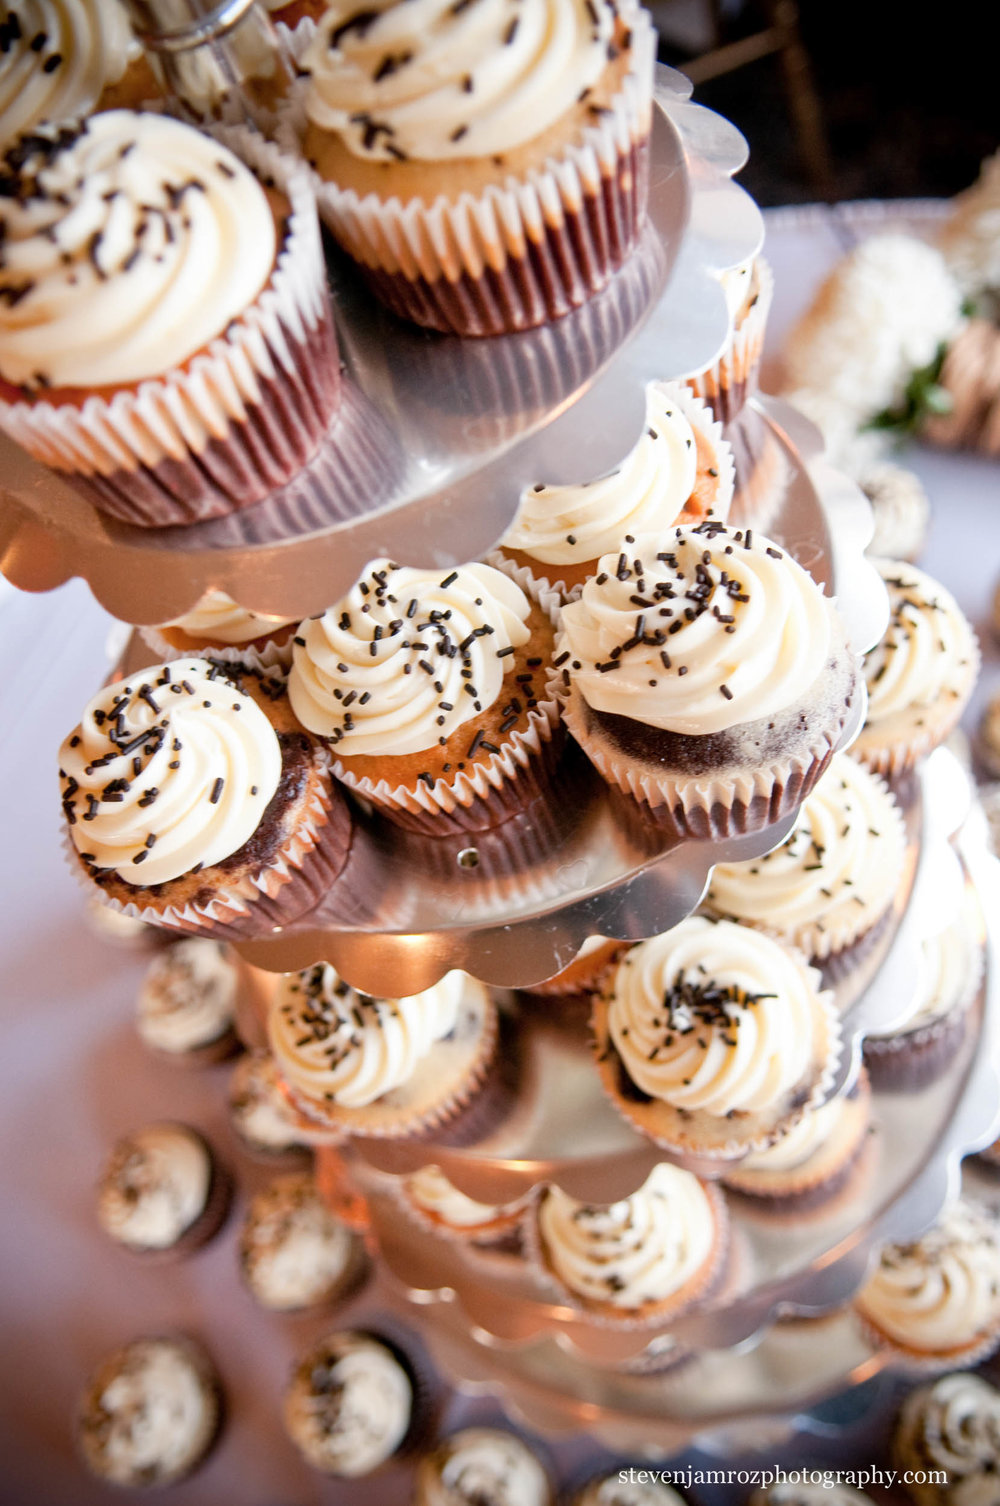 chocolate-cupcakes-wedding-raleigh-steven-jamroz-photography-0263.jpg